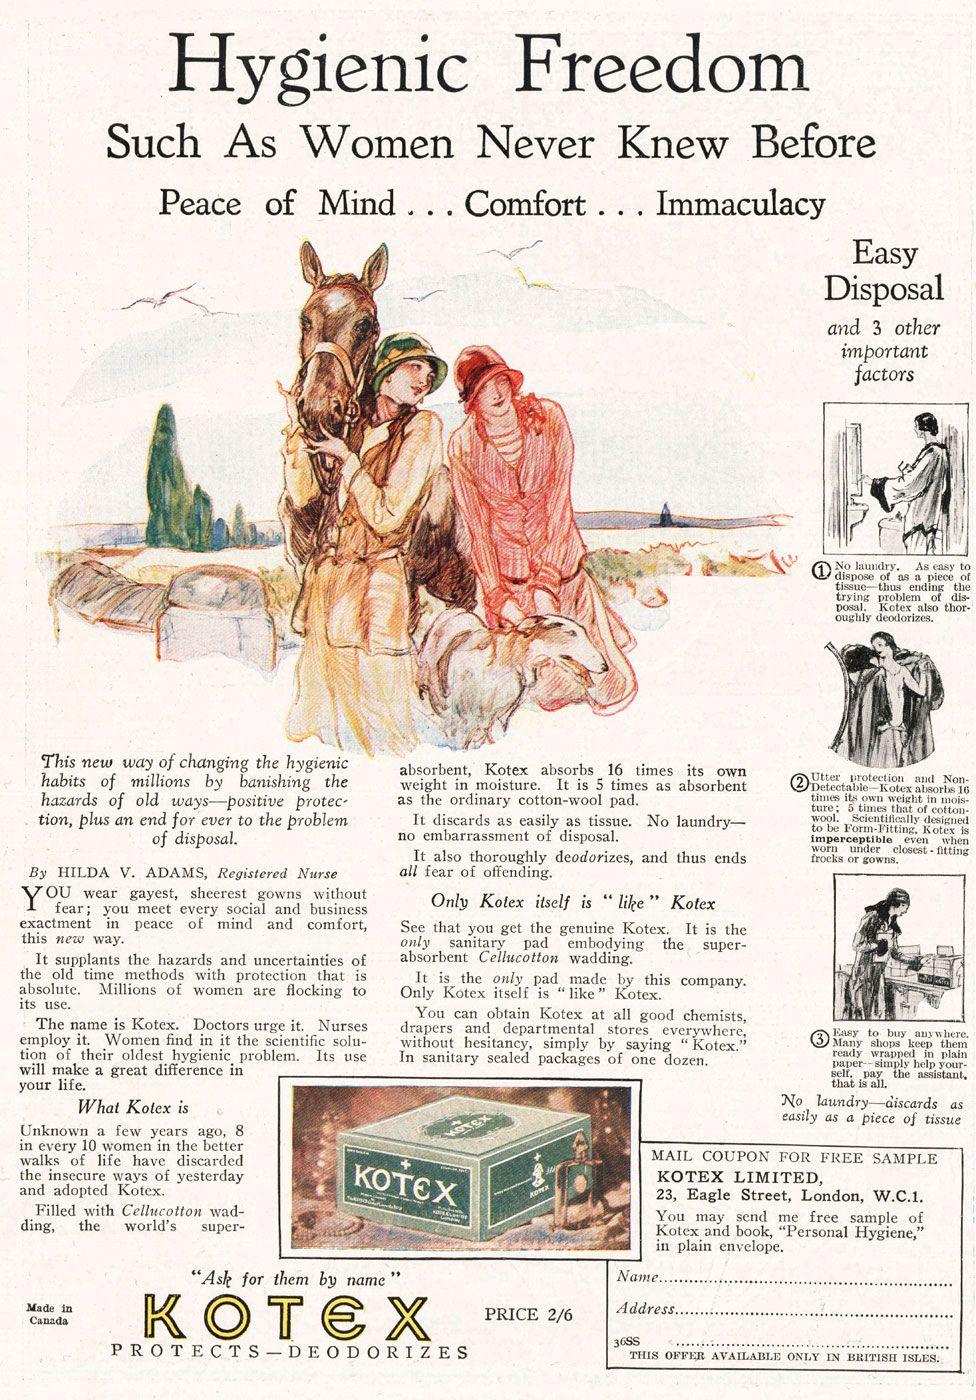 Kotex advert from 1928